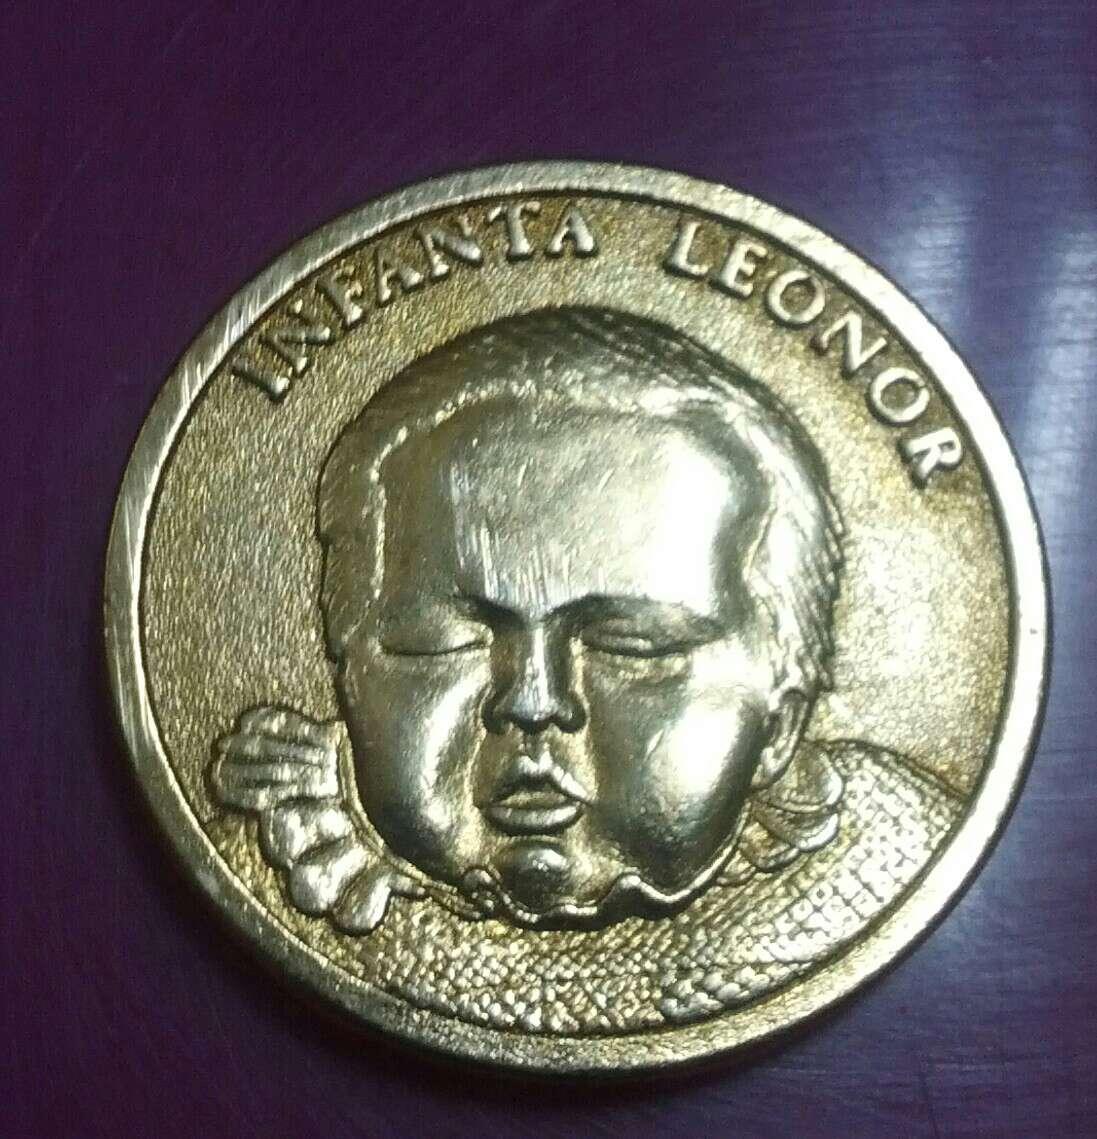 Imagen moneda infanta leonor